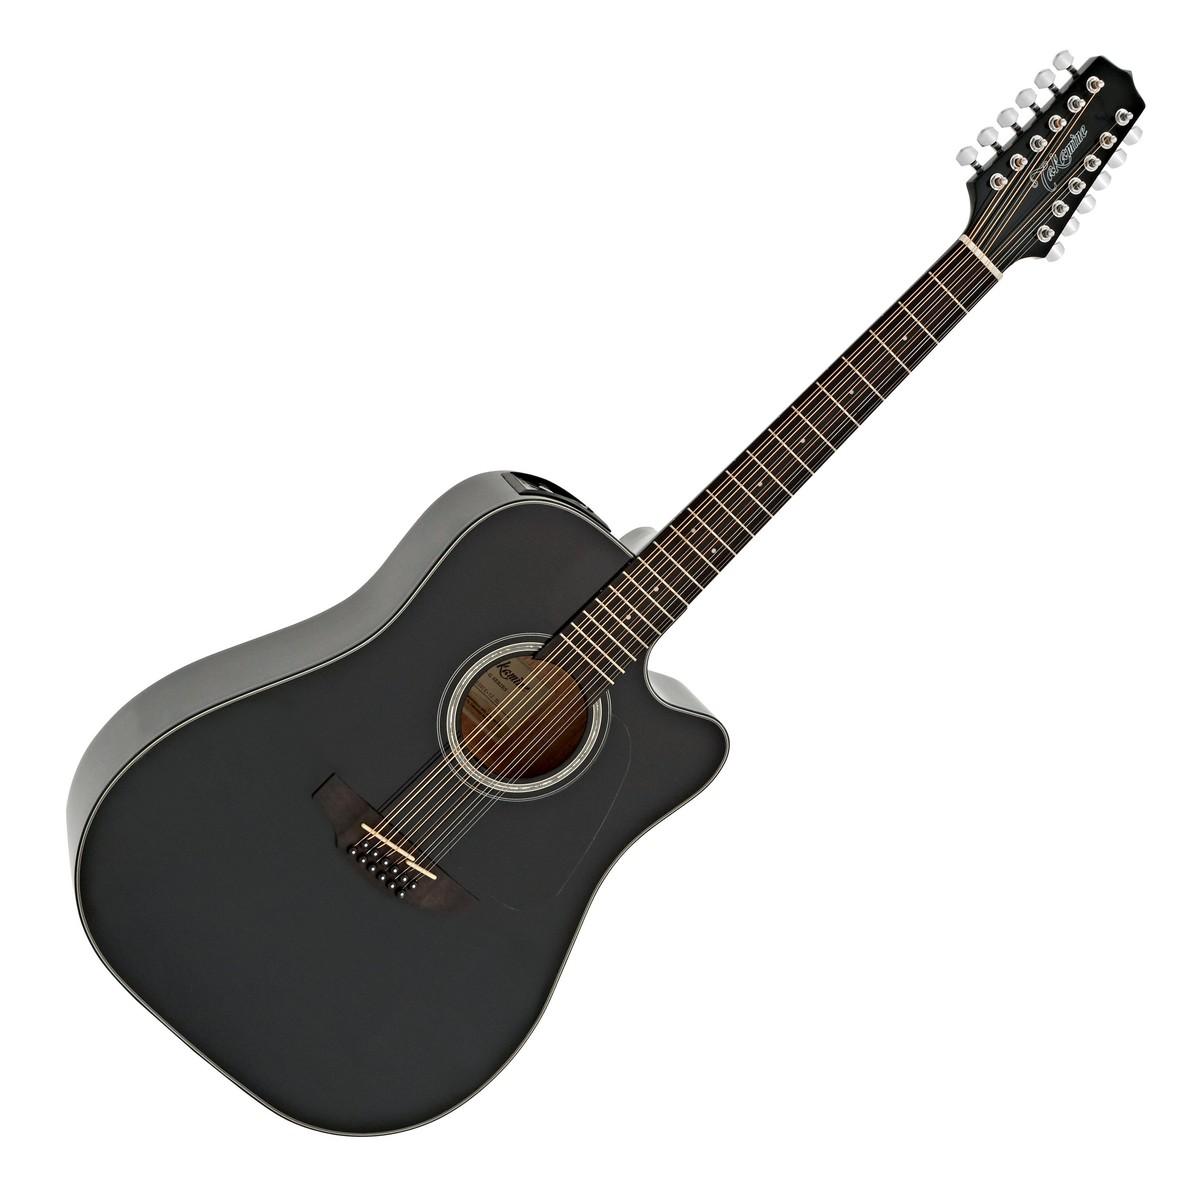 takamine gd30ce 12 string electro acoustic black at gear4music. Black Bedroom Furniture Sets. Home Design Ideas